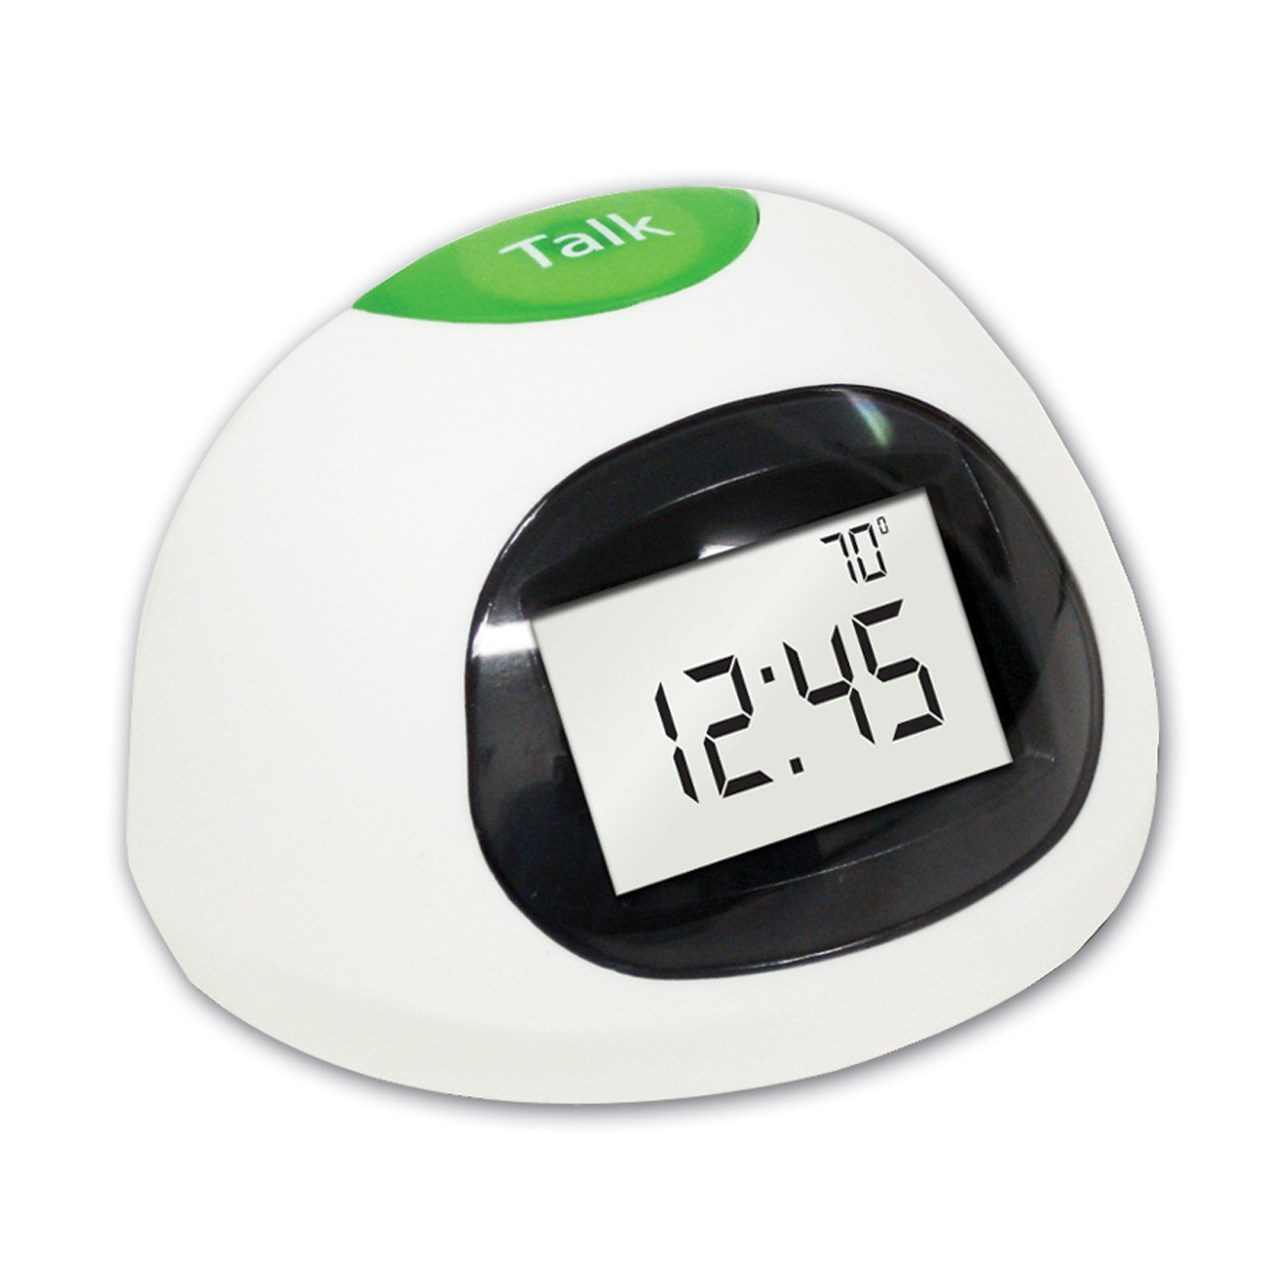 Talking Time and Temp Desktop Clock